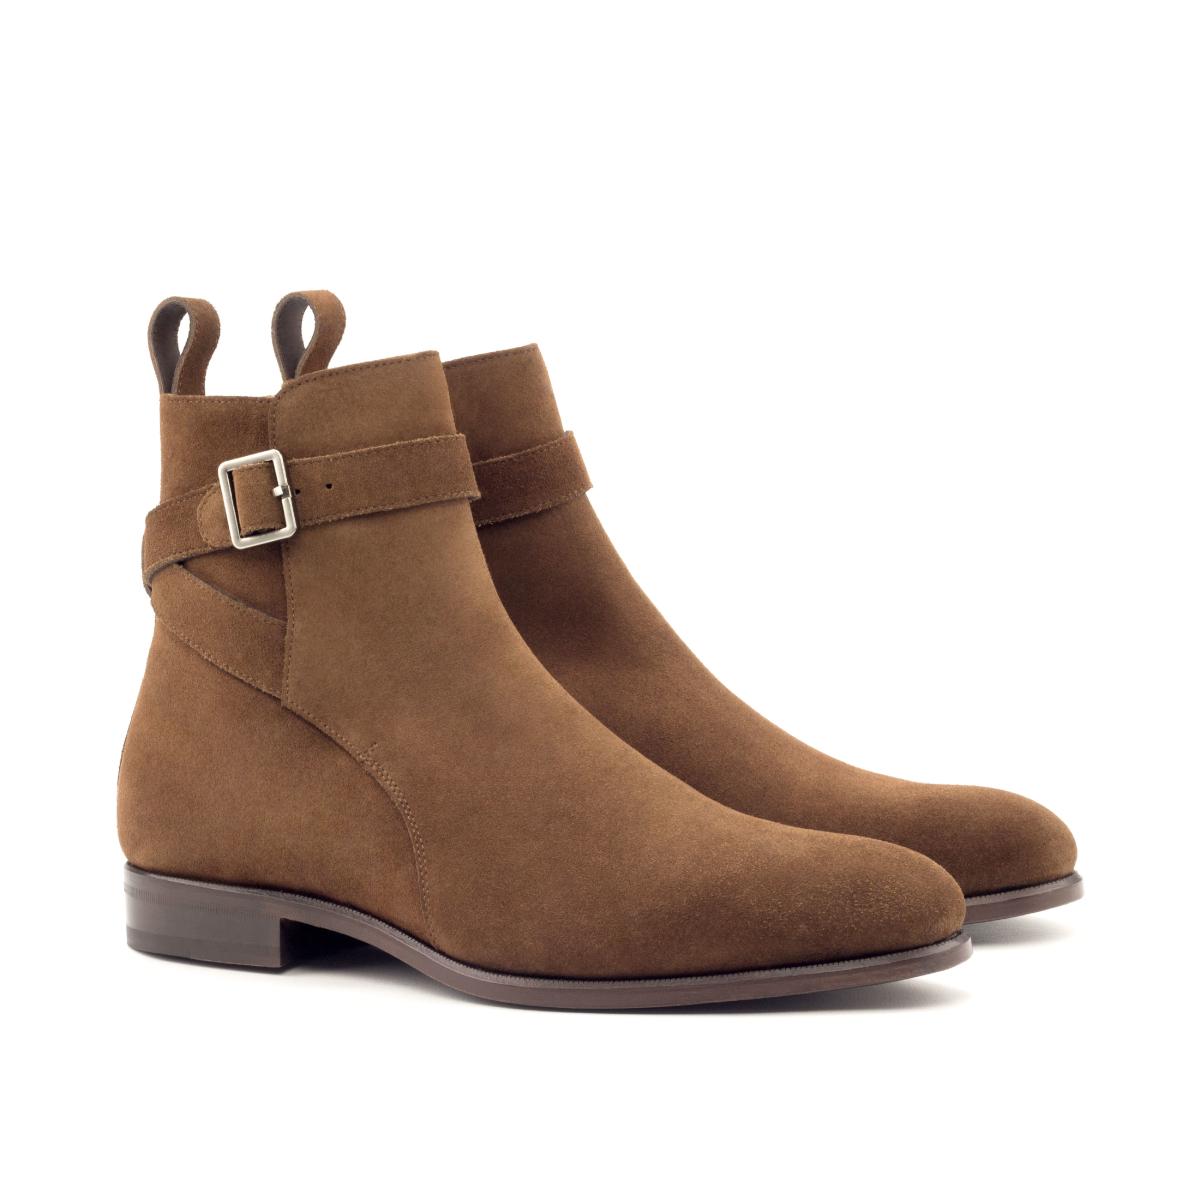 Tobacco brown suede Jodhpur boot Cambrillon